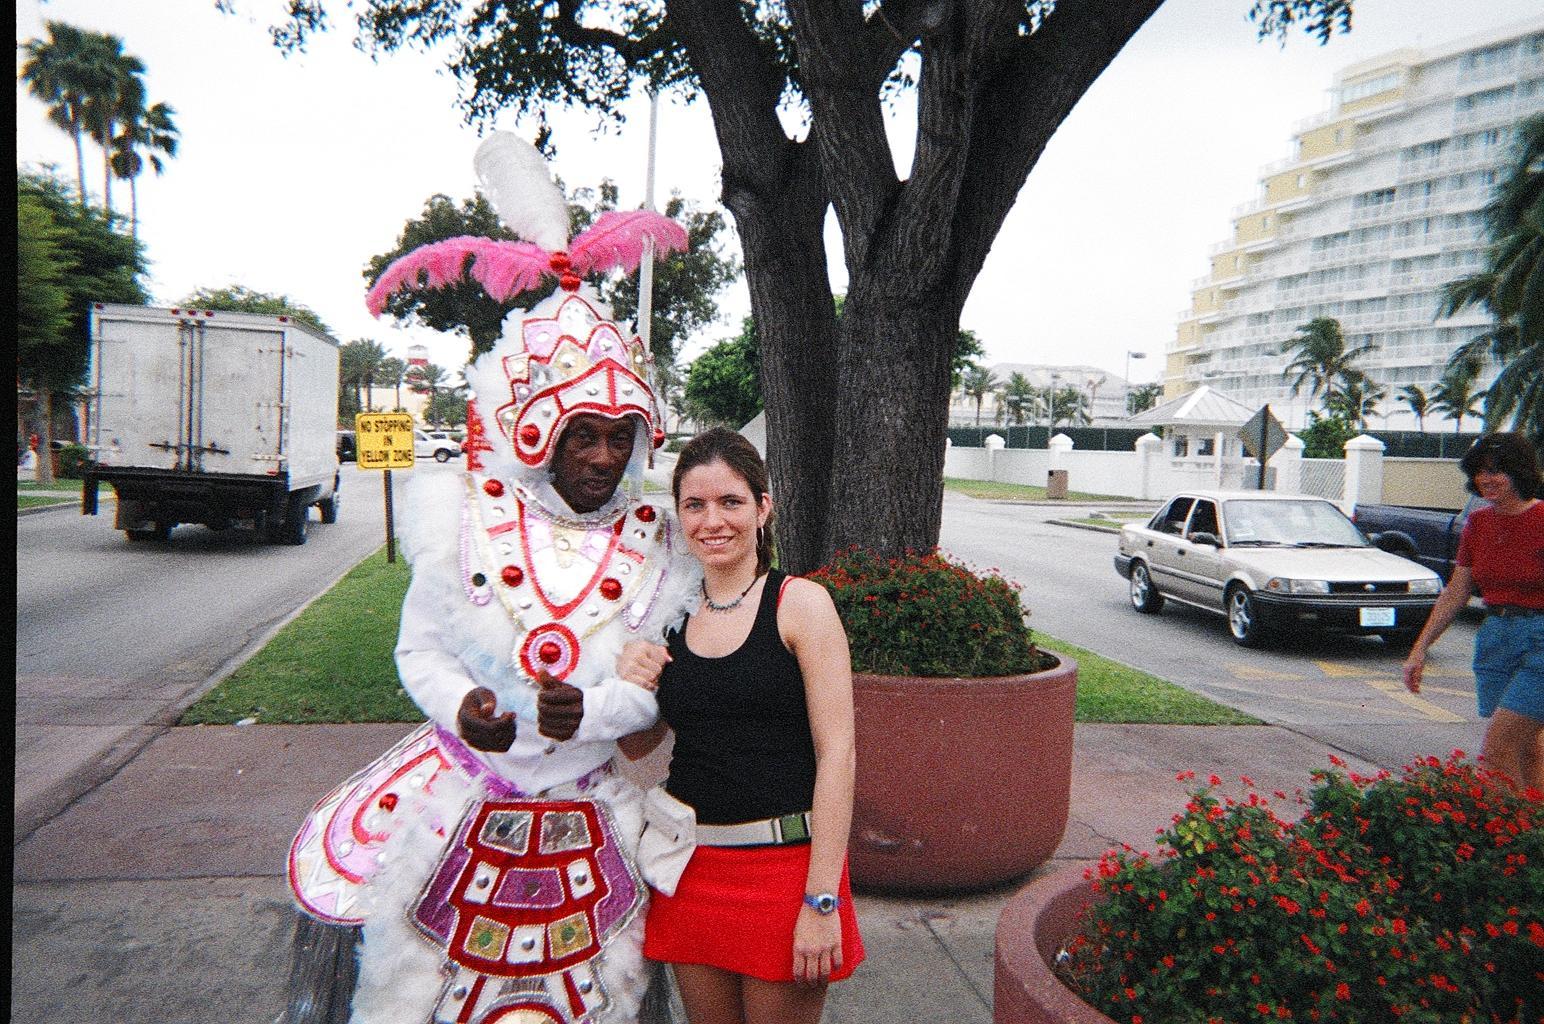 Me & the Mardi Grais Guy-Freeport, Bahamas.jpg